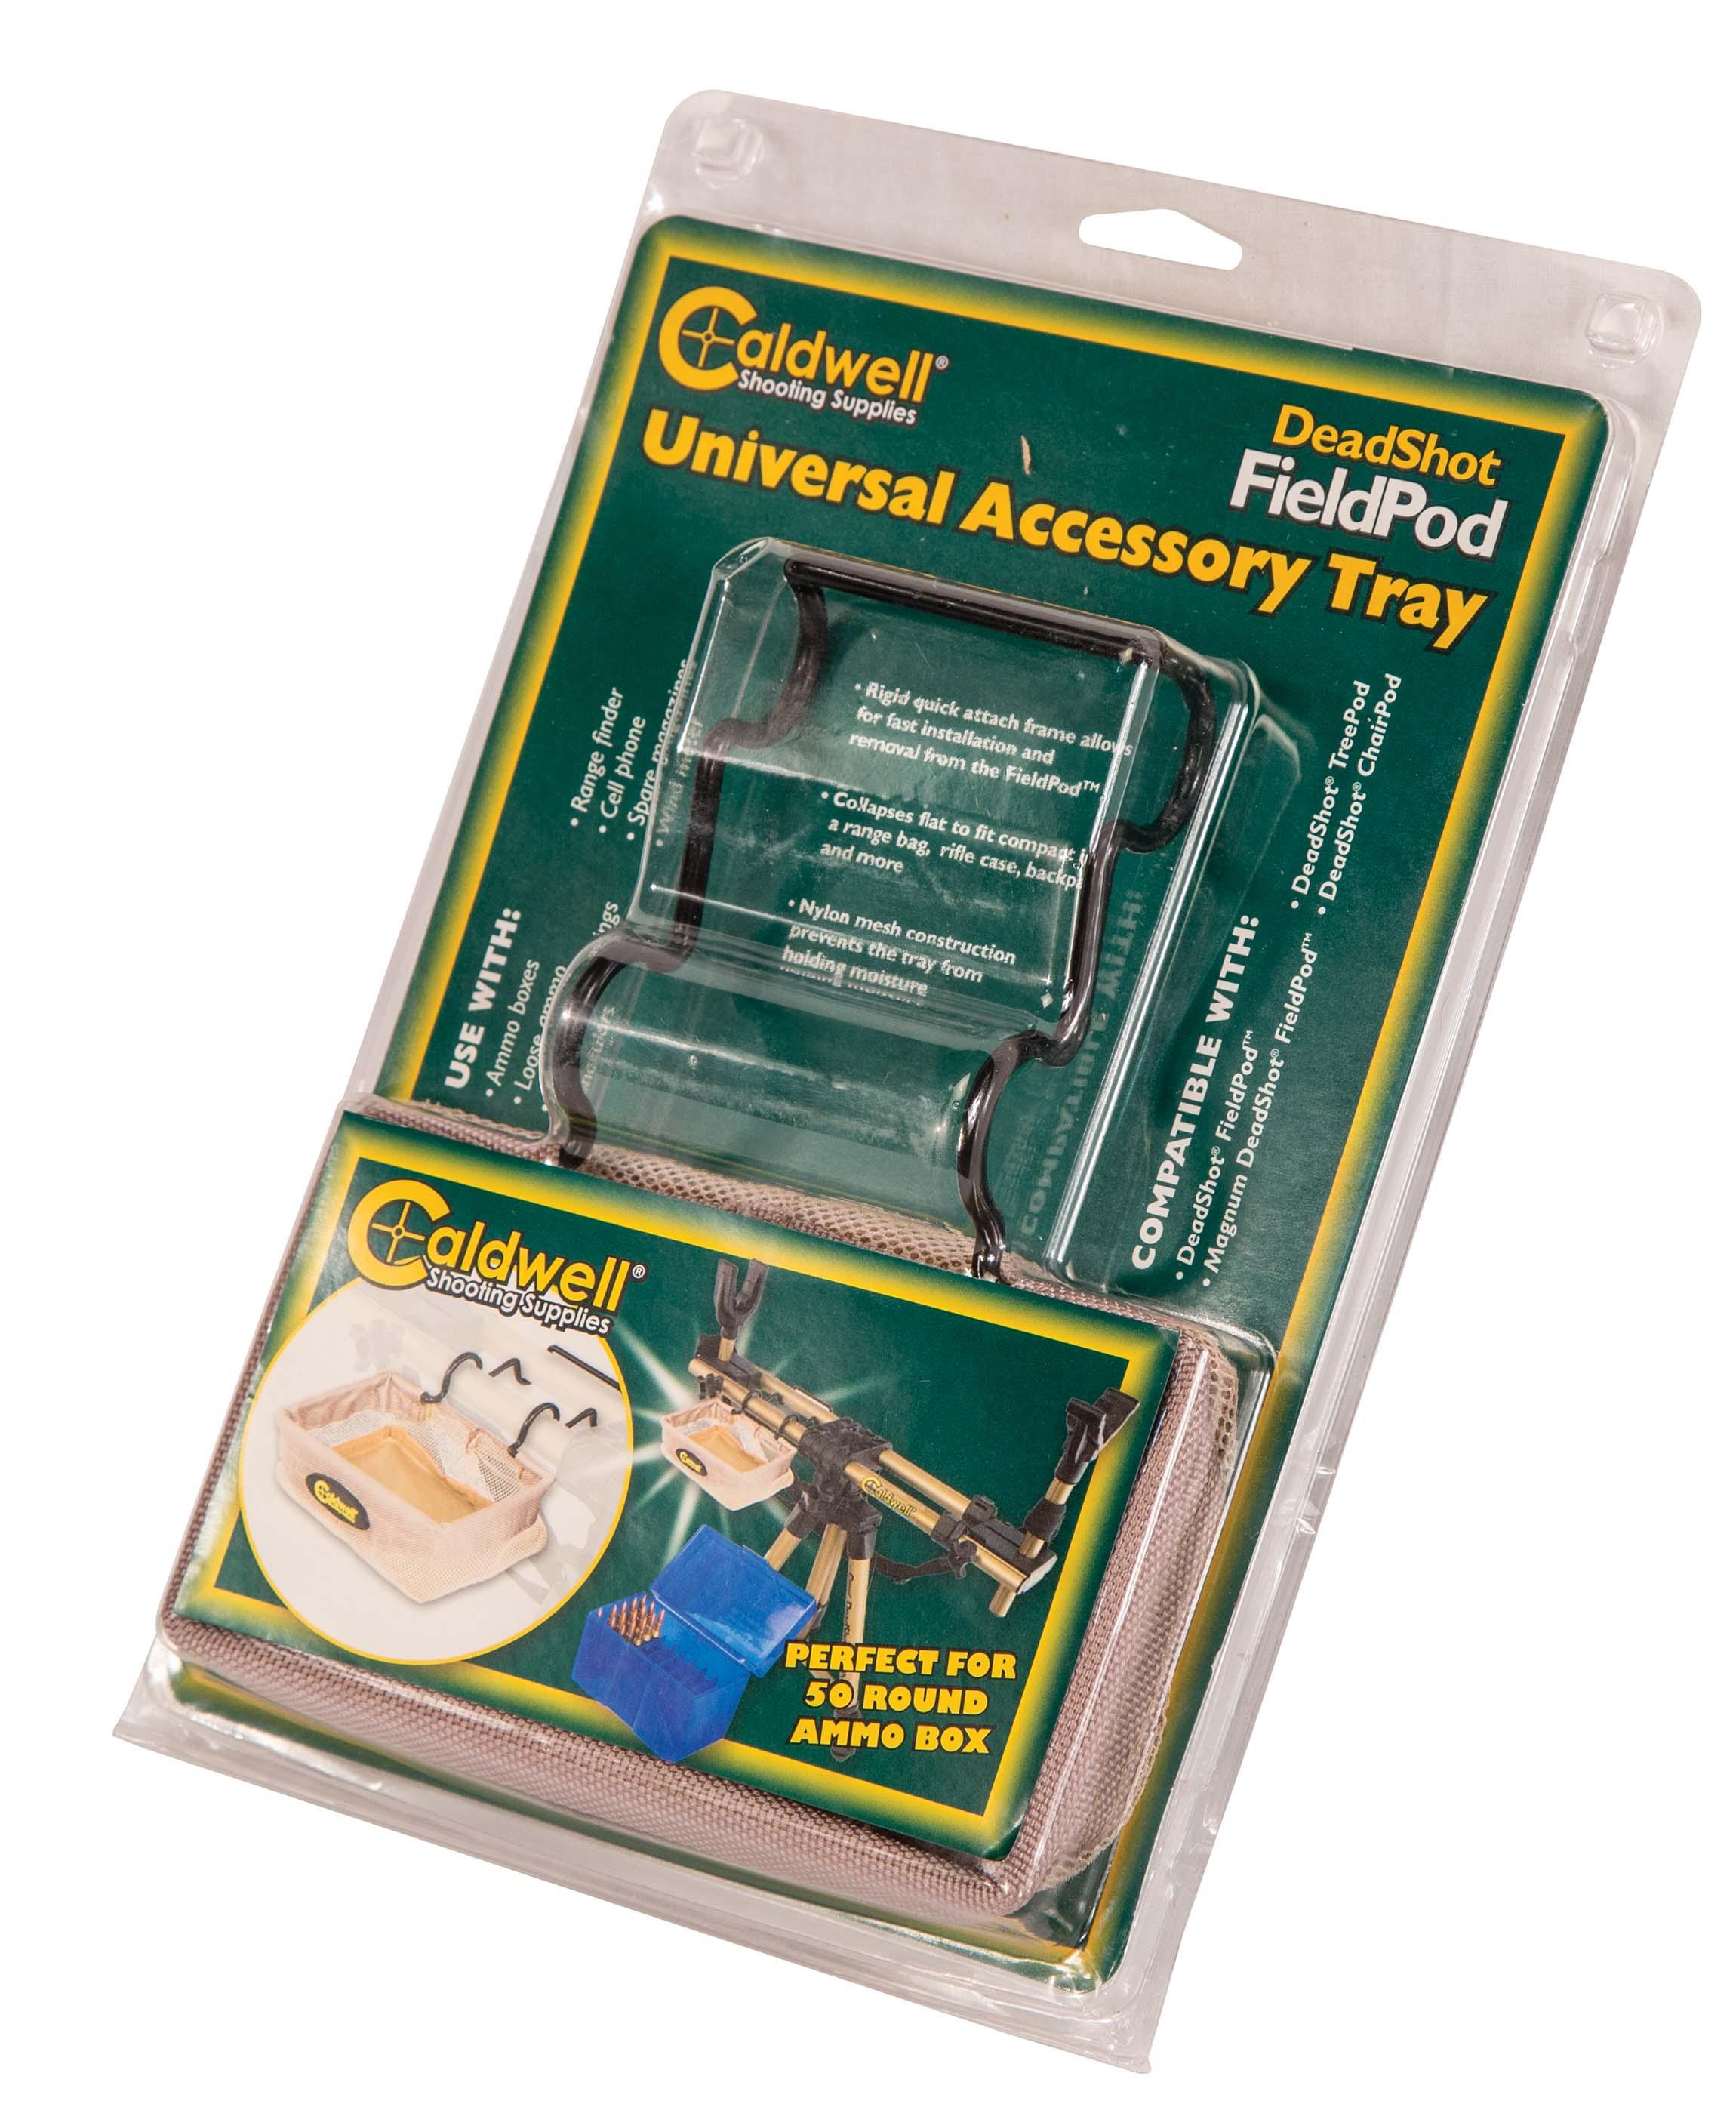 DeadShot® Universal Accessory Tray - 759432 box